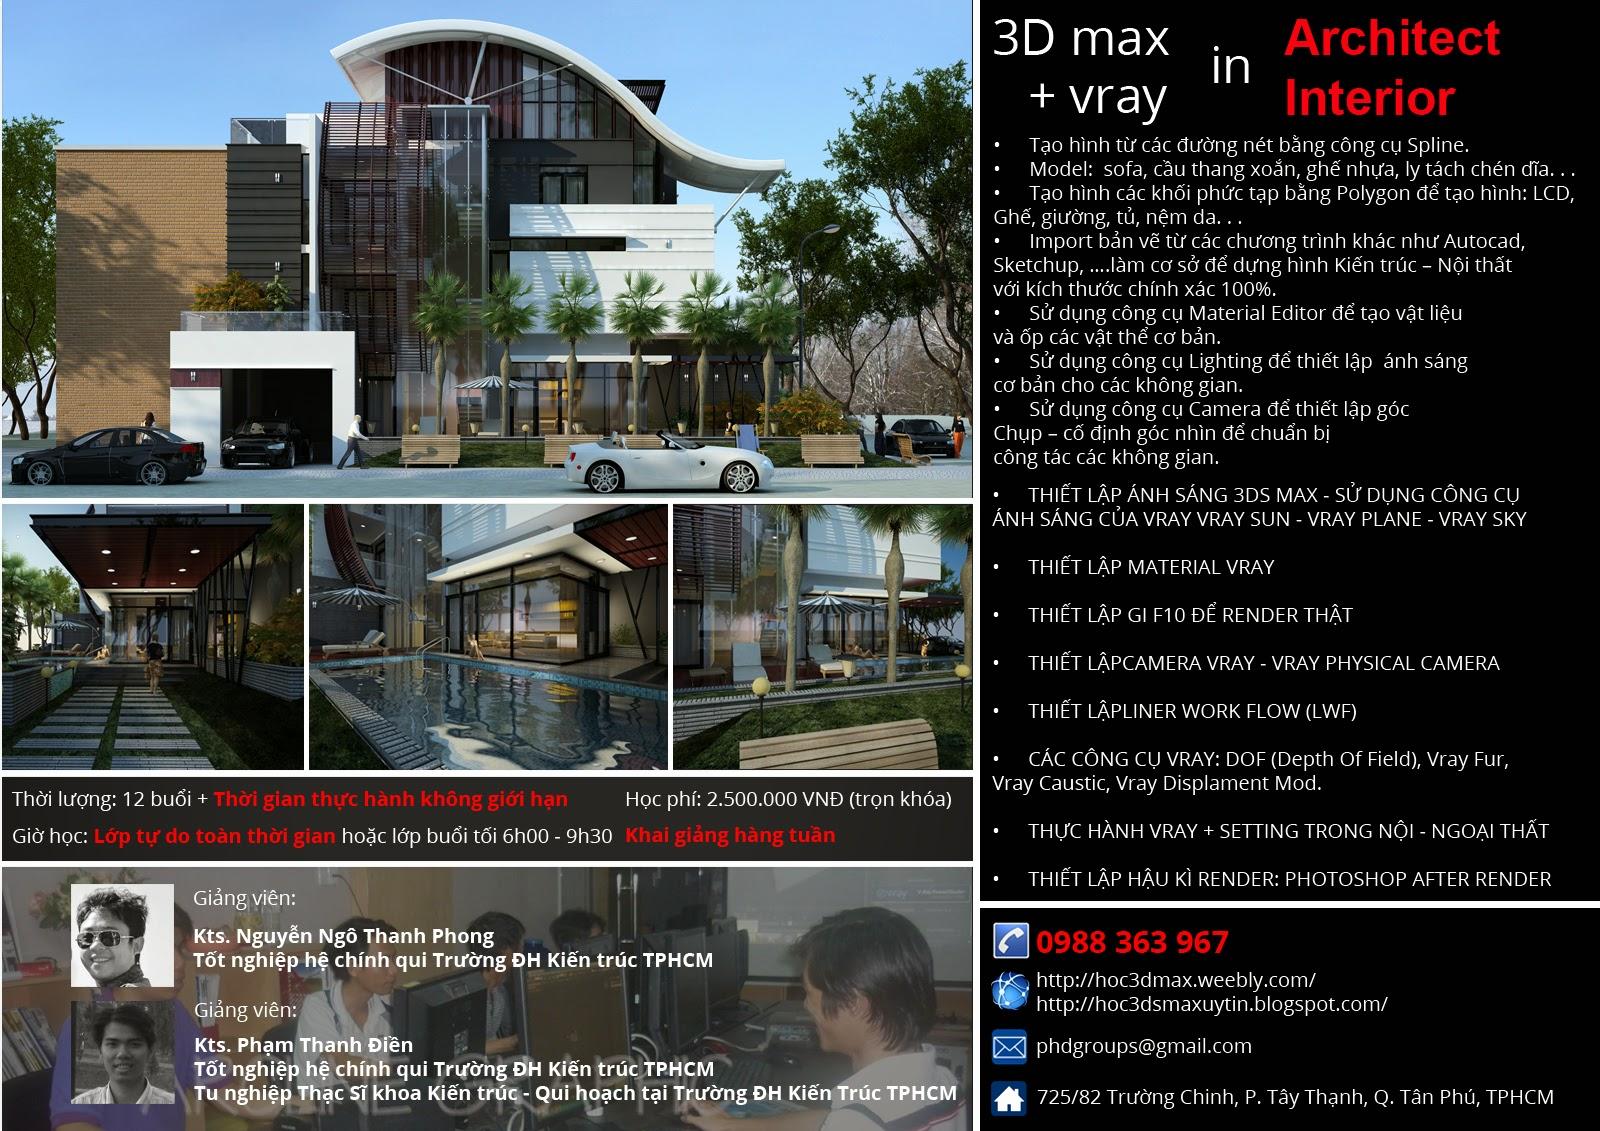 Khóa học 3d max, autocad, sketchup, revit tại tphcm